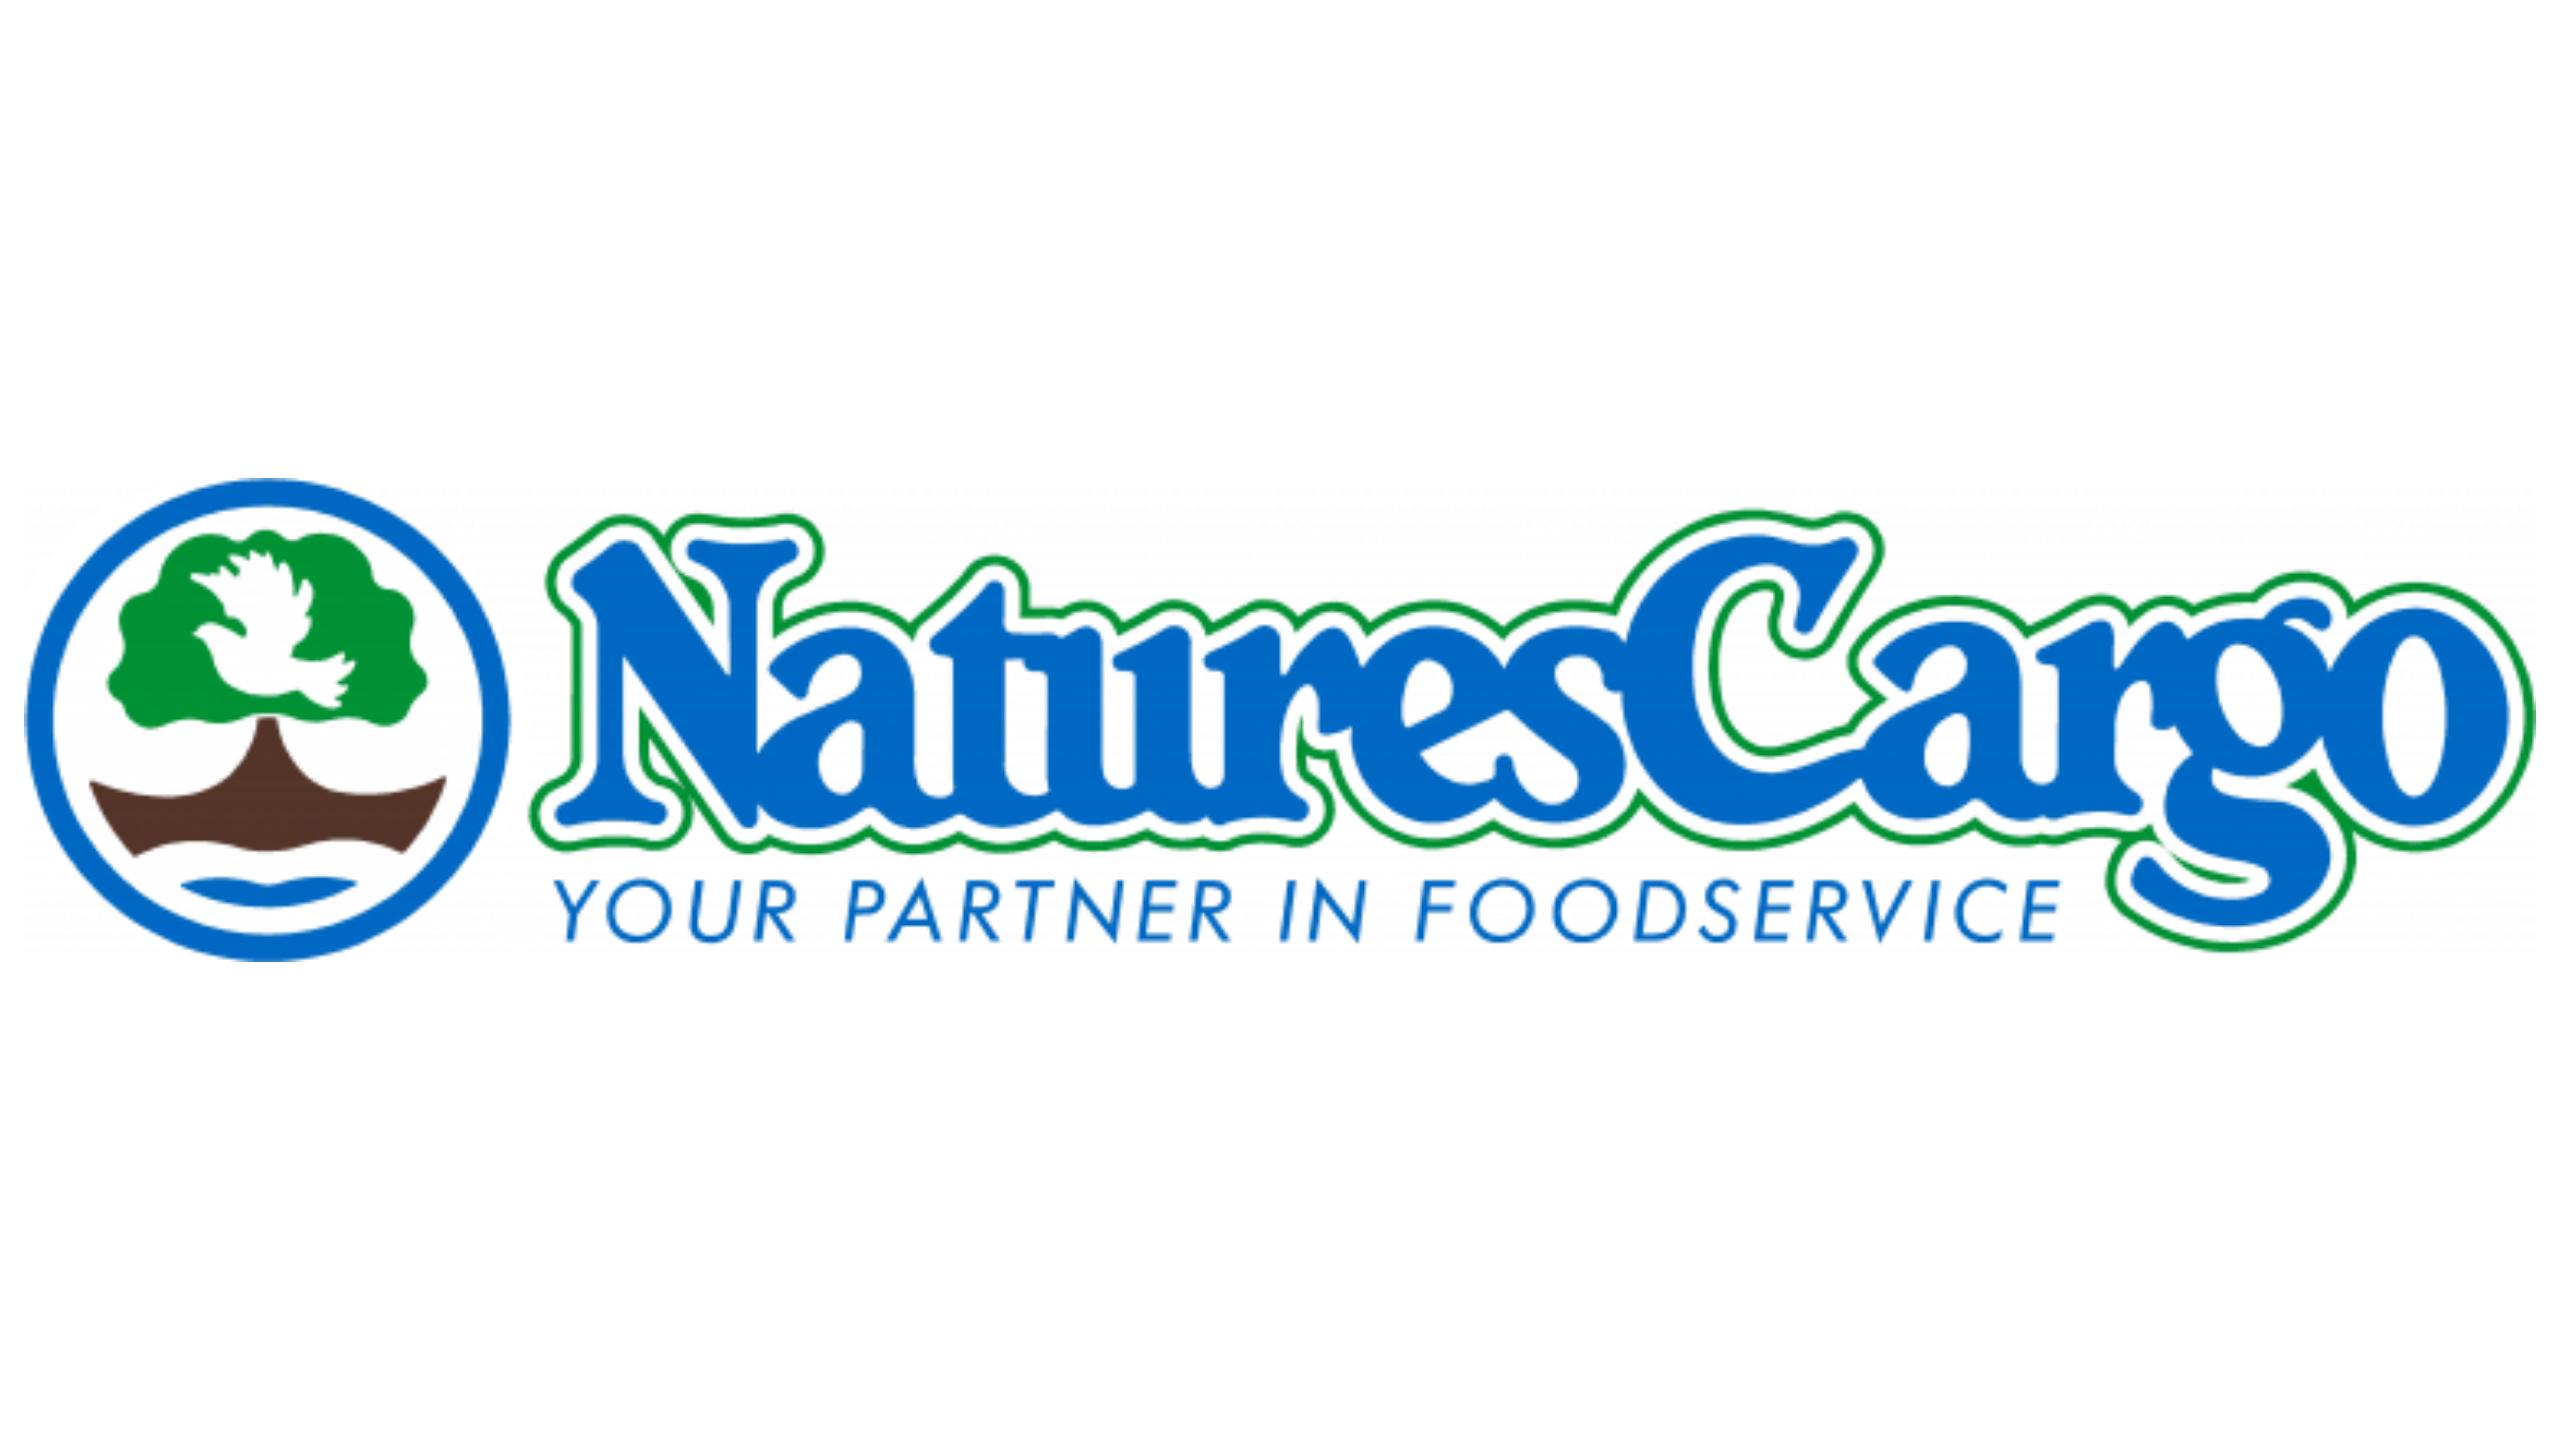 Natures Cargo (Screen)